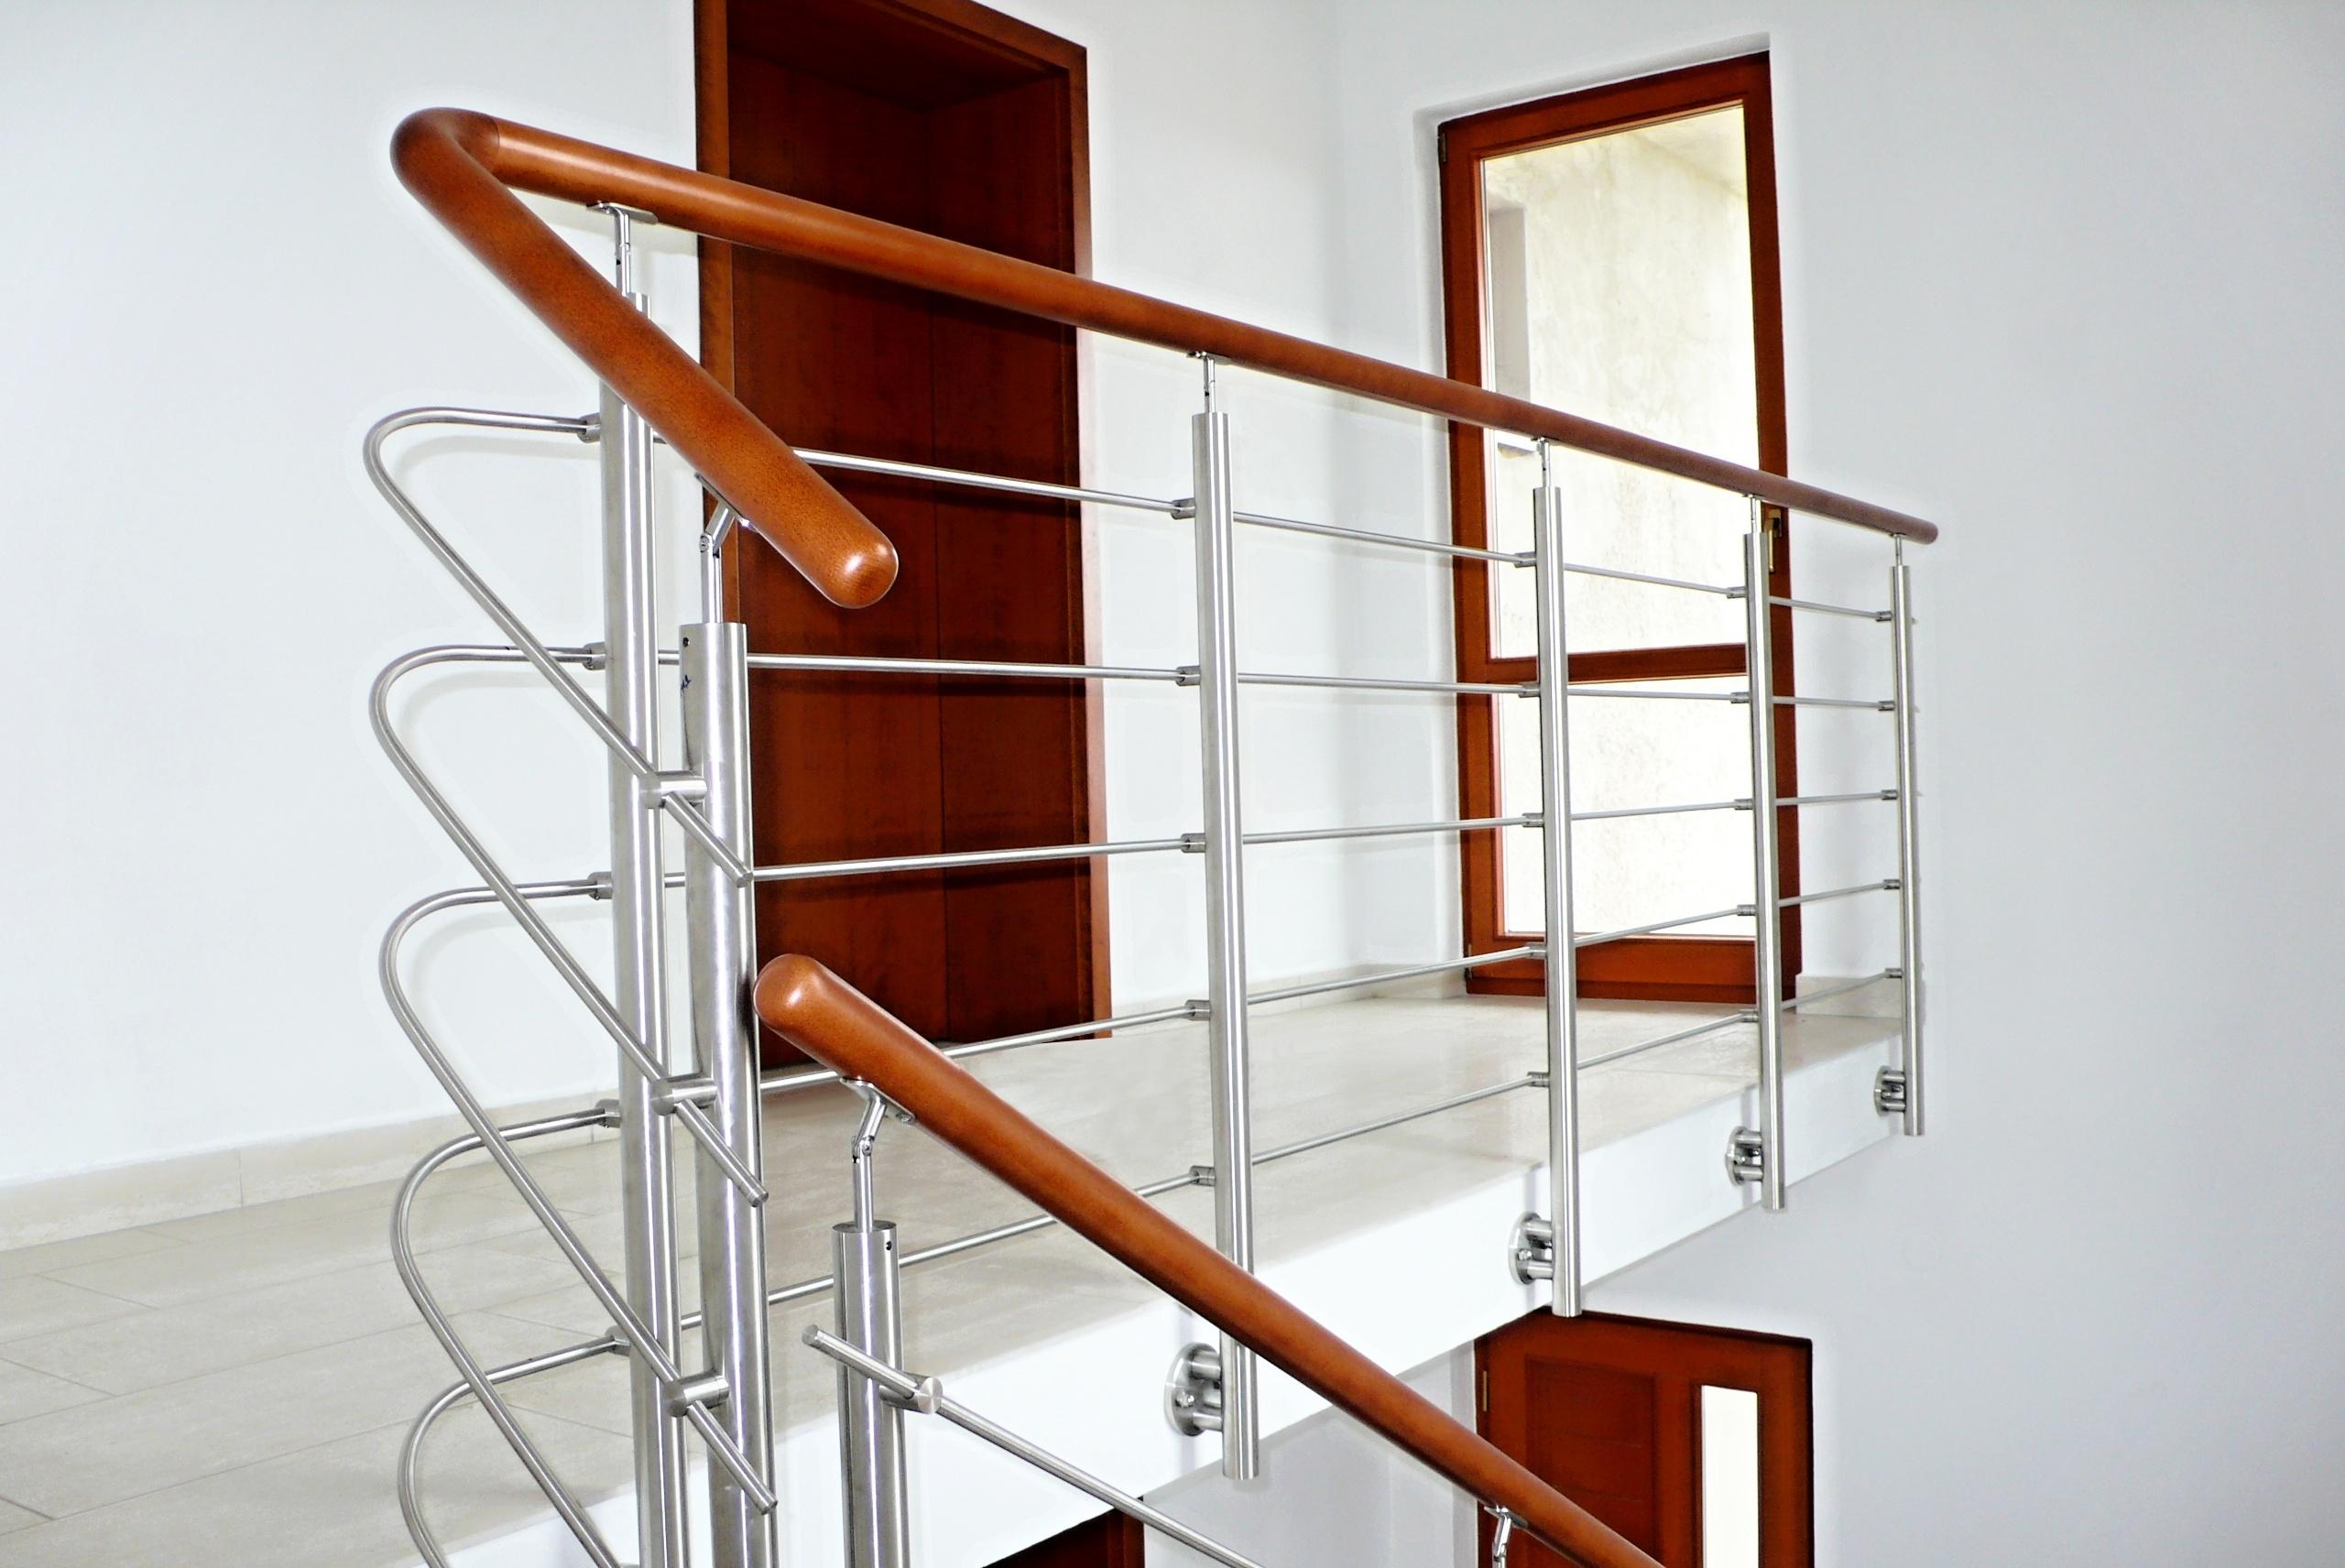 Galerie – balkonové zábradlí